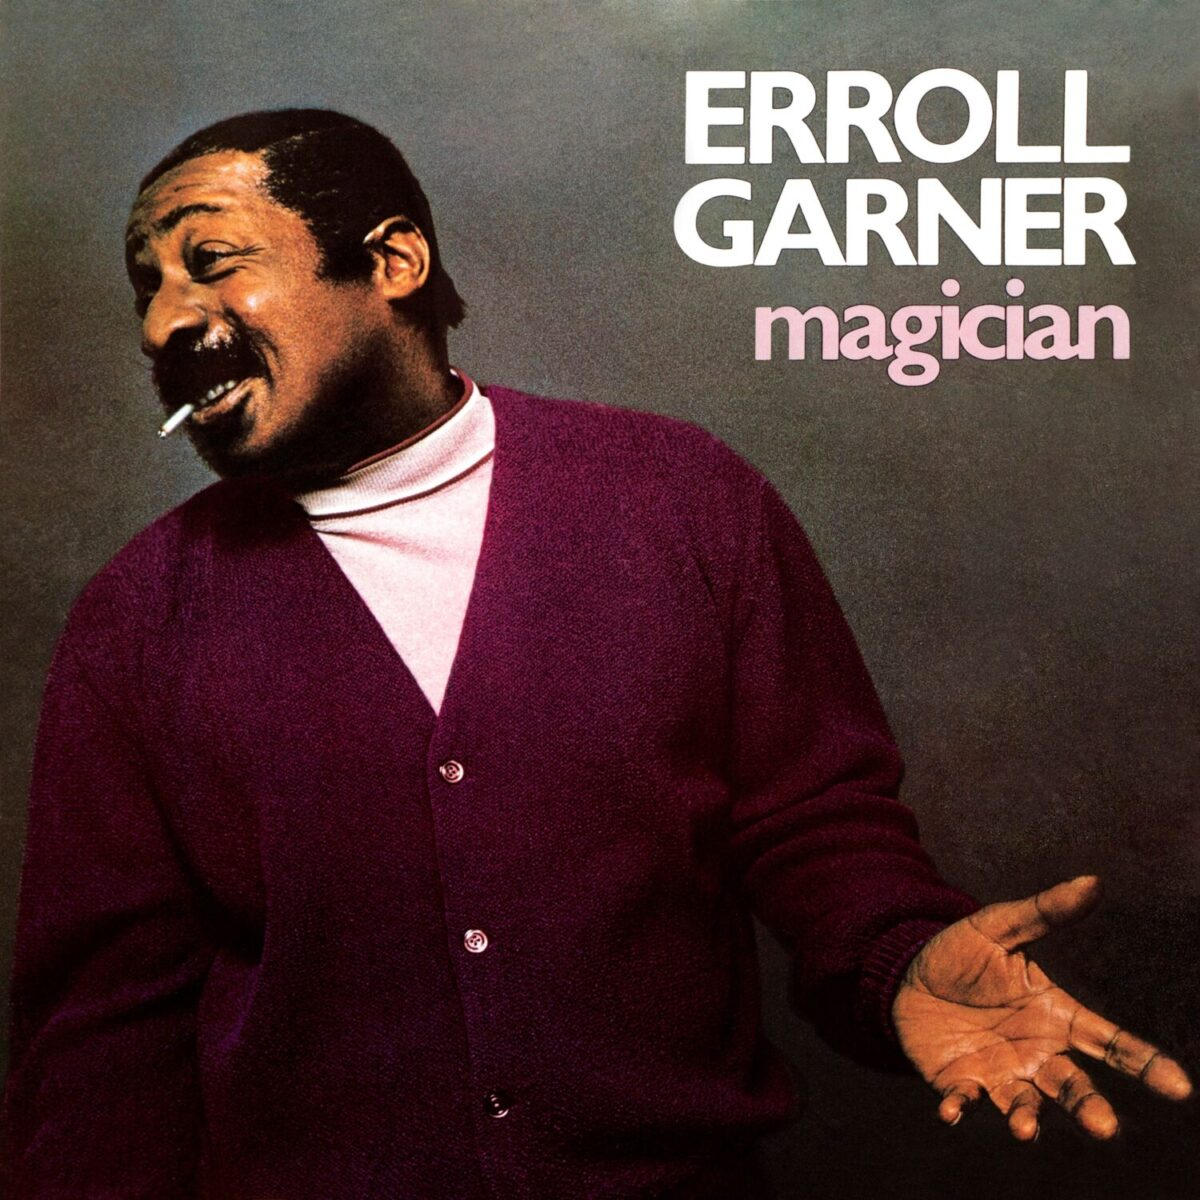 Erroll Garner Magician